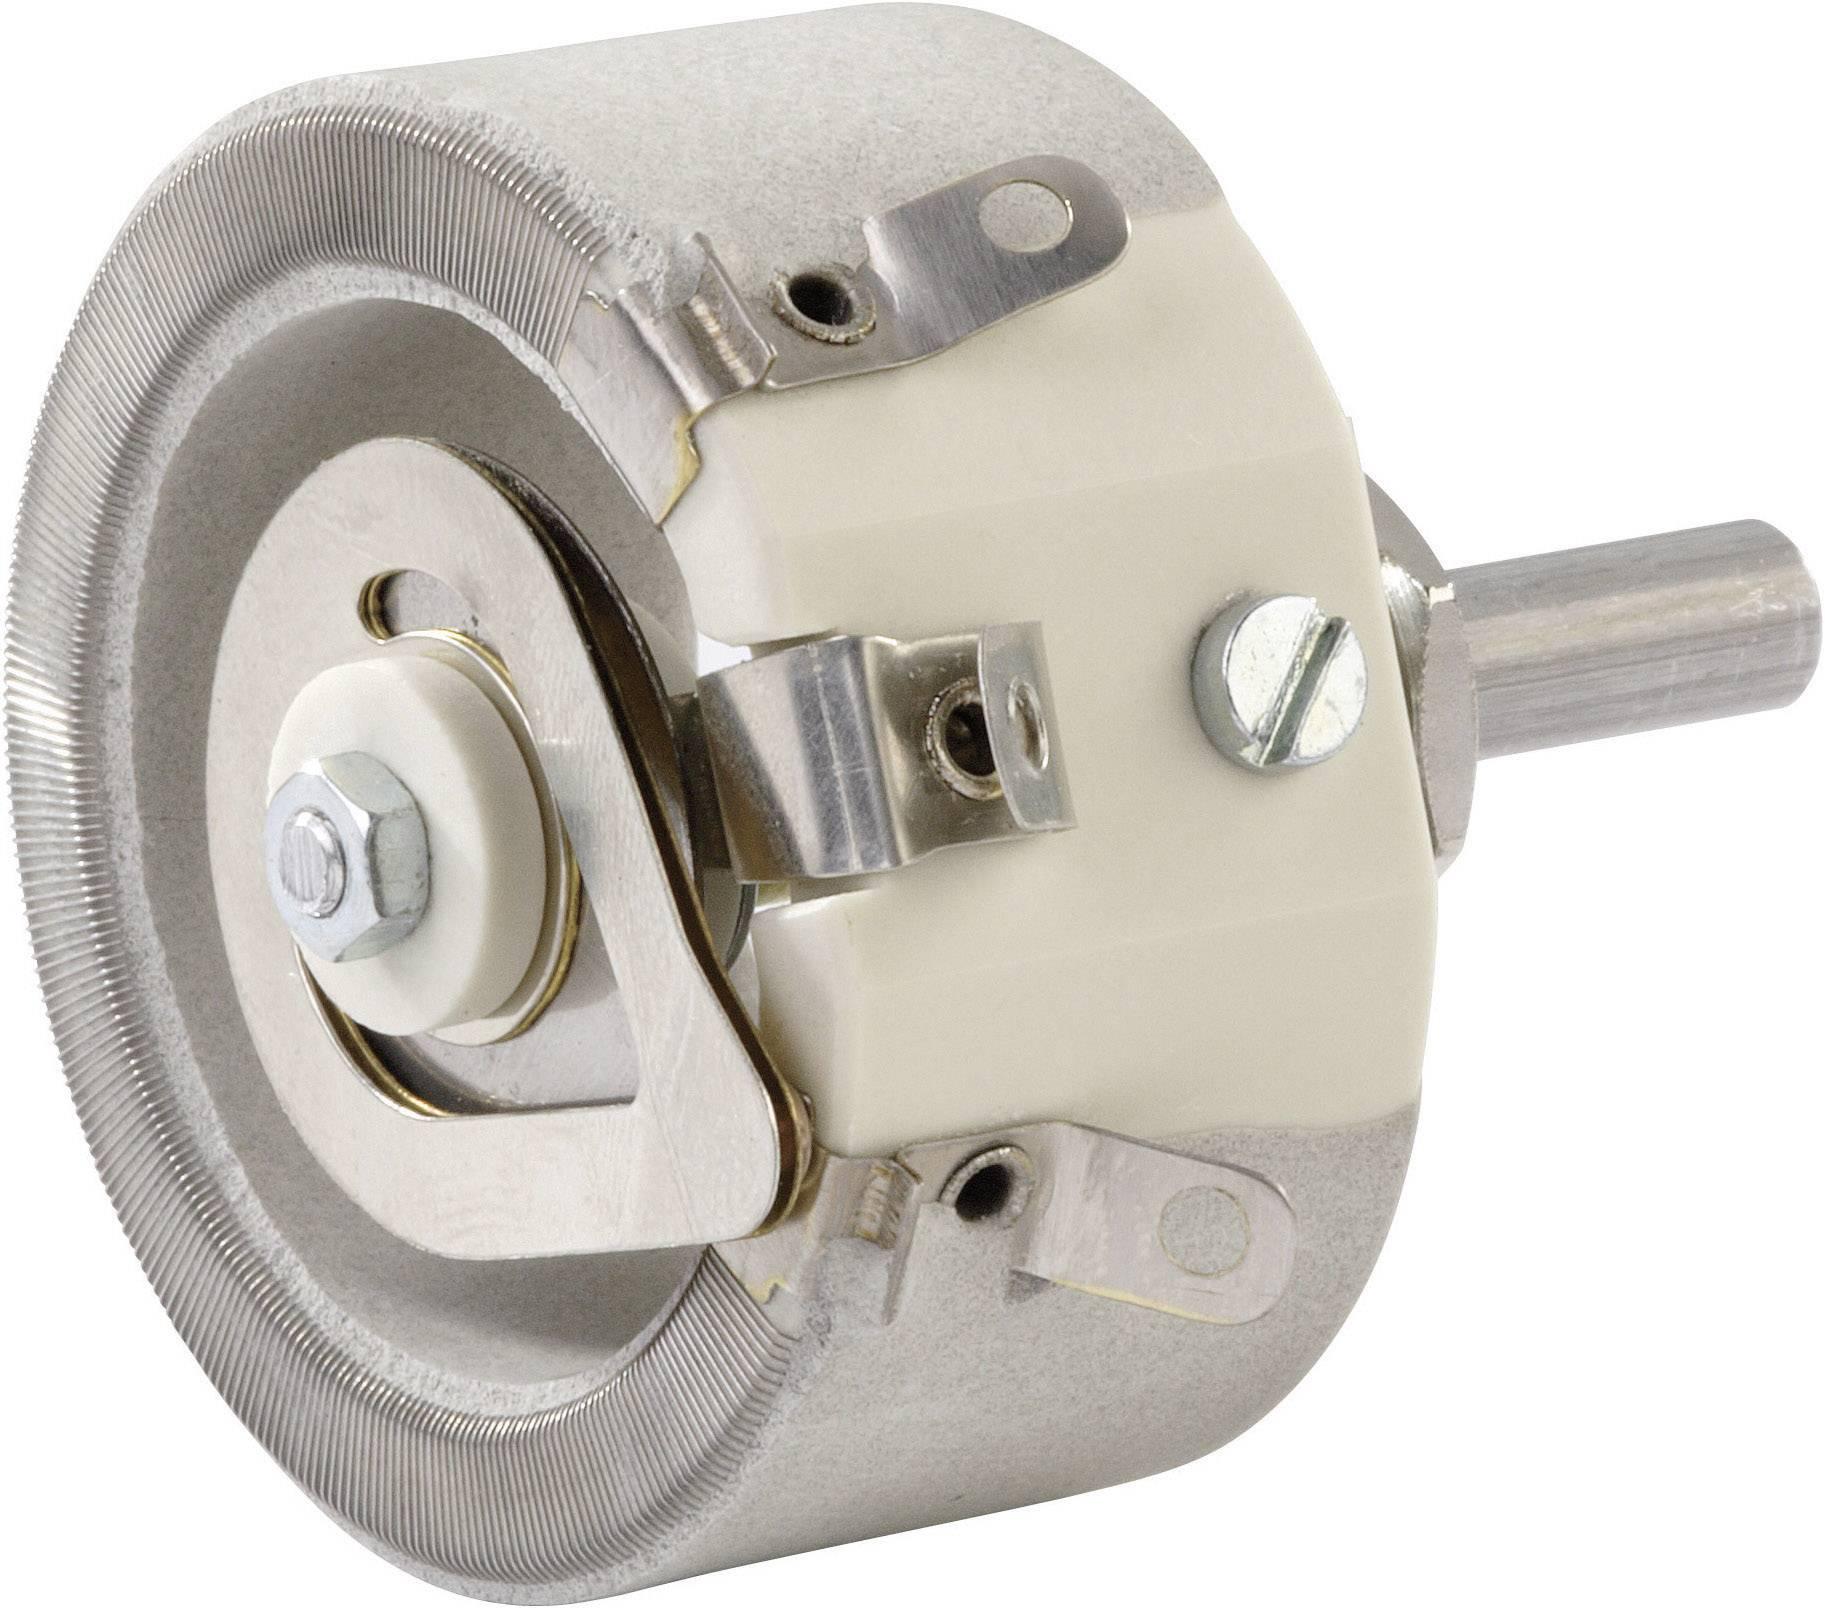 Drôtový potenciometer mono TT Electronics AB 3191006000 3191006000, 10 W, 1 kOhm, 1 ks